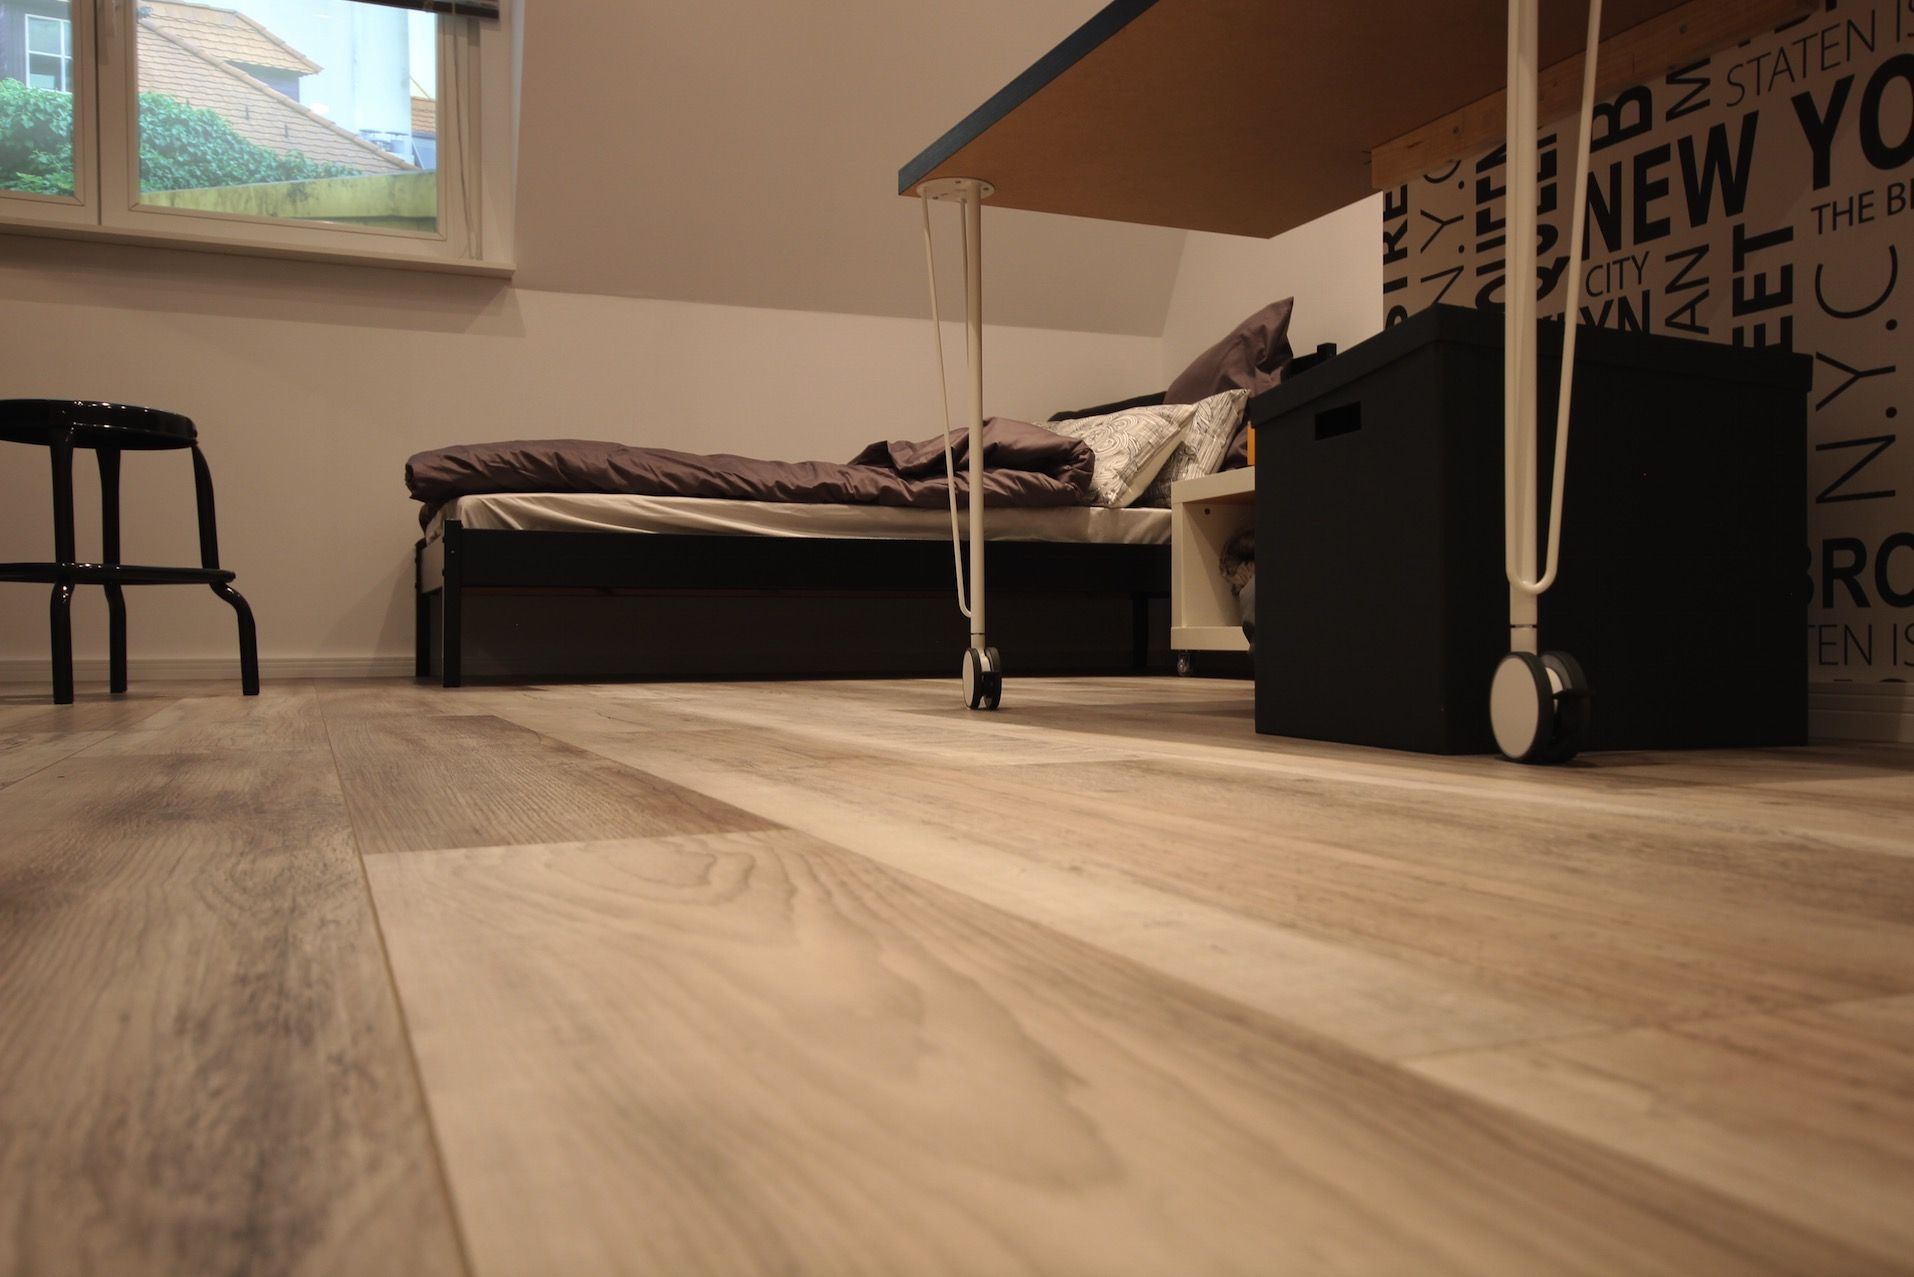 paneele wei hochglanz amazing paneele weiss hochglanz ideen paneele weiss wohnzimmer ideens. Black Bedroom Furniture Sets. Home Design Ideas